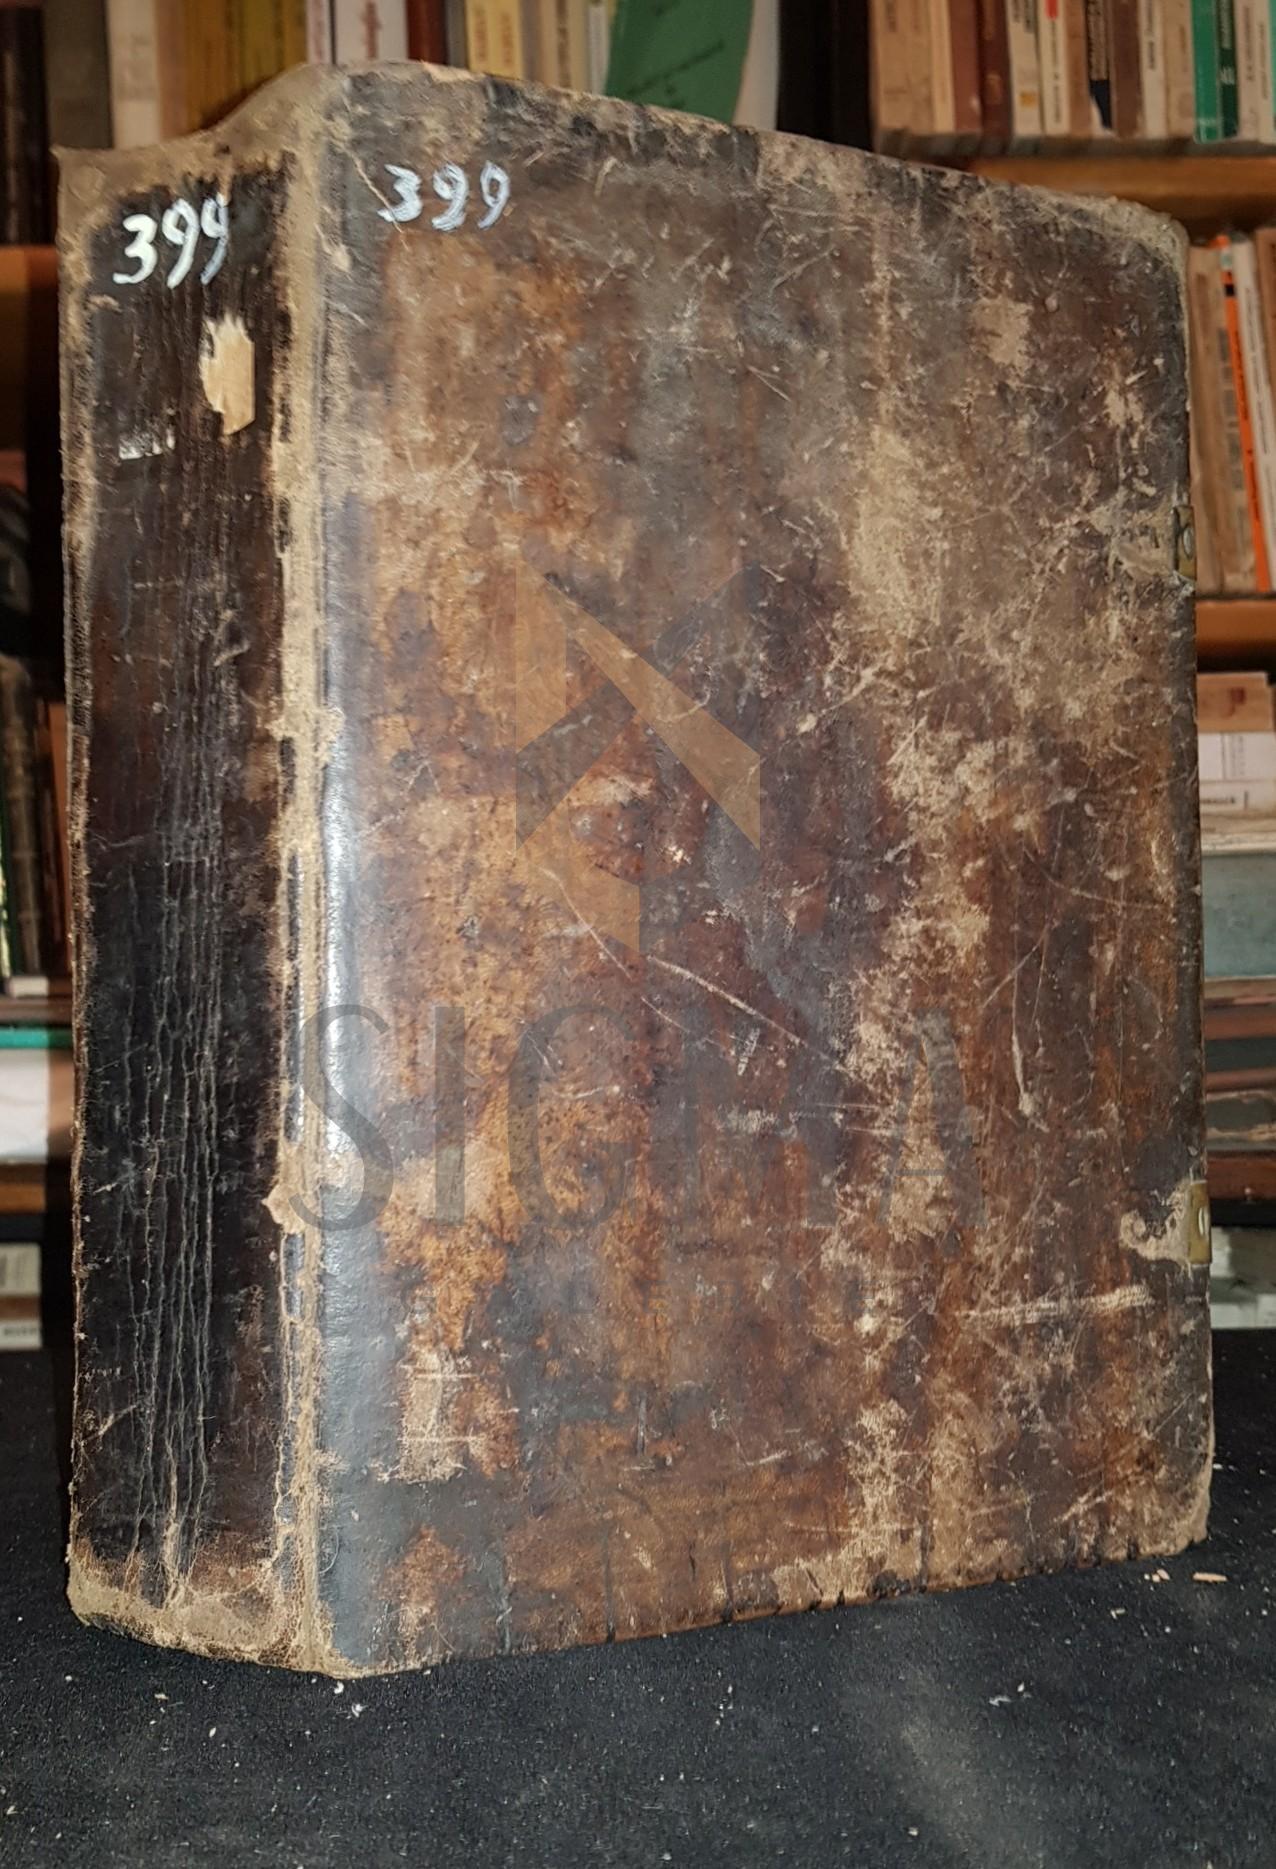 CHIRIACODROMION, 1801, Bucuresti (Bibliografia Romaneasca Veche, Tomul II, 1716-1808, BRV !)